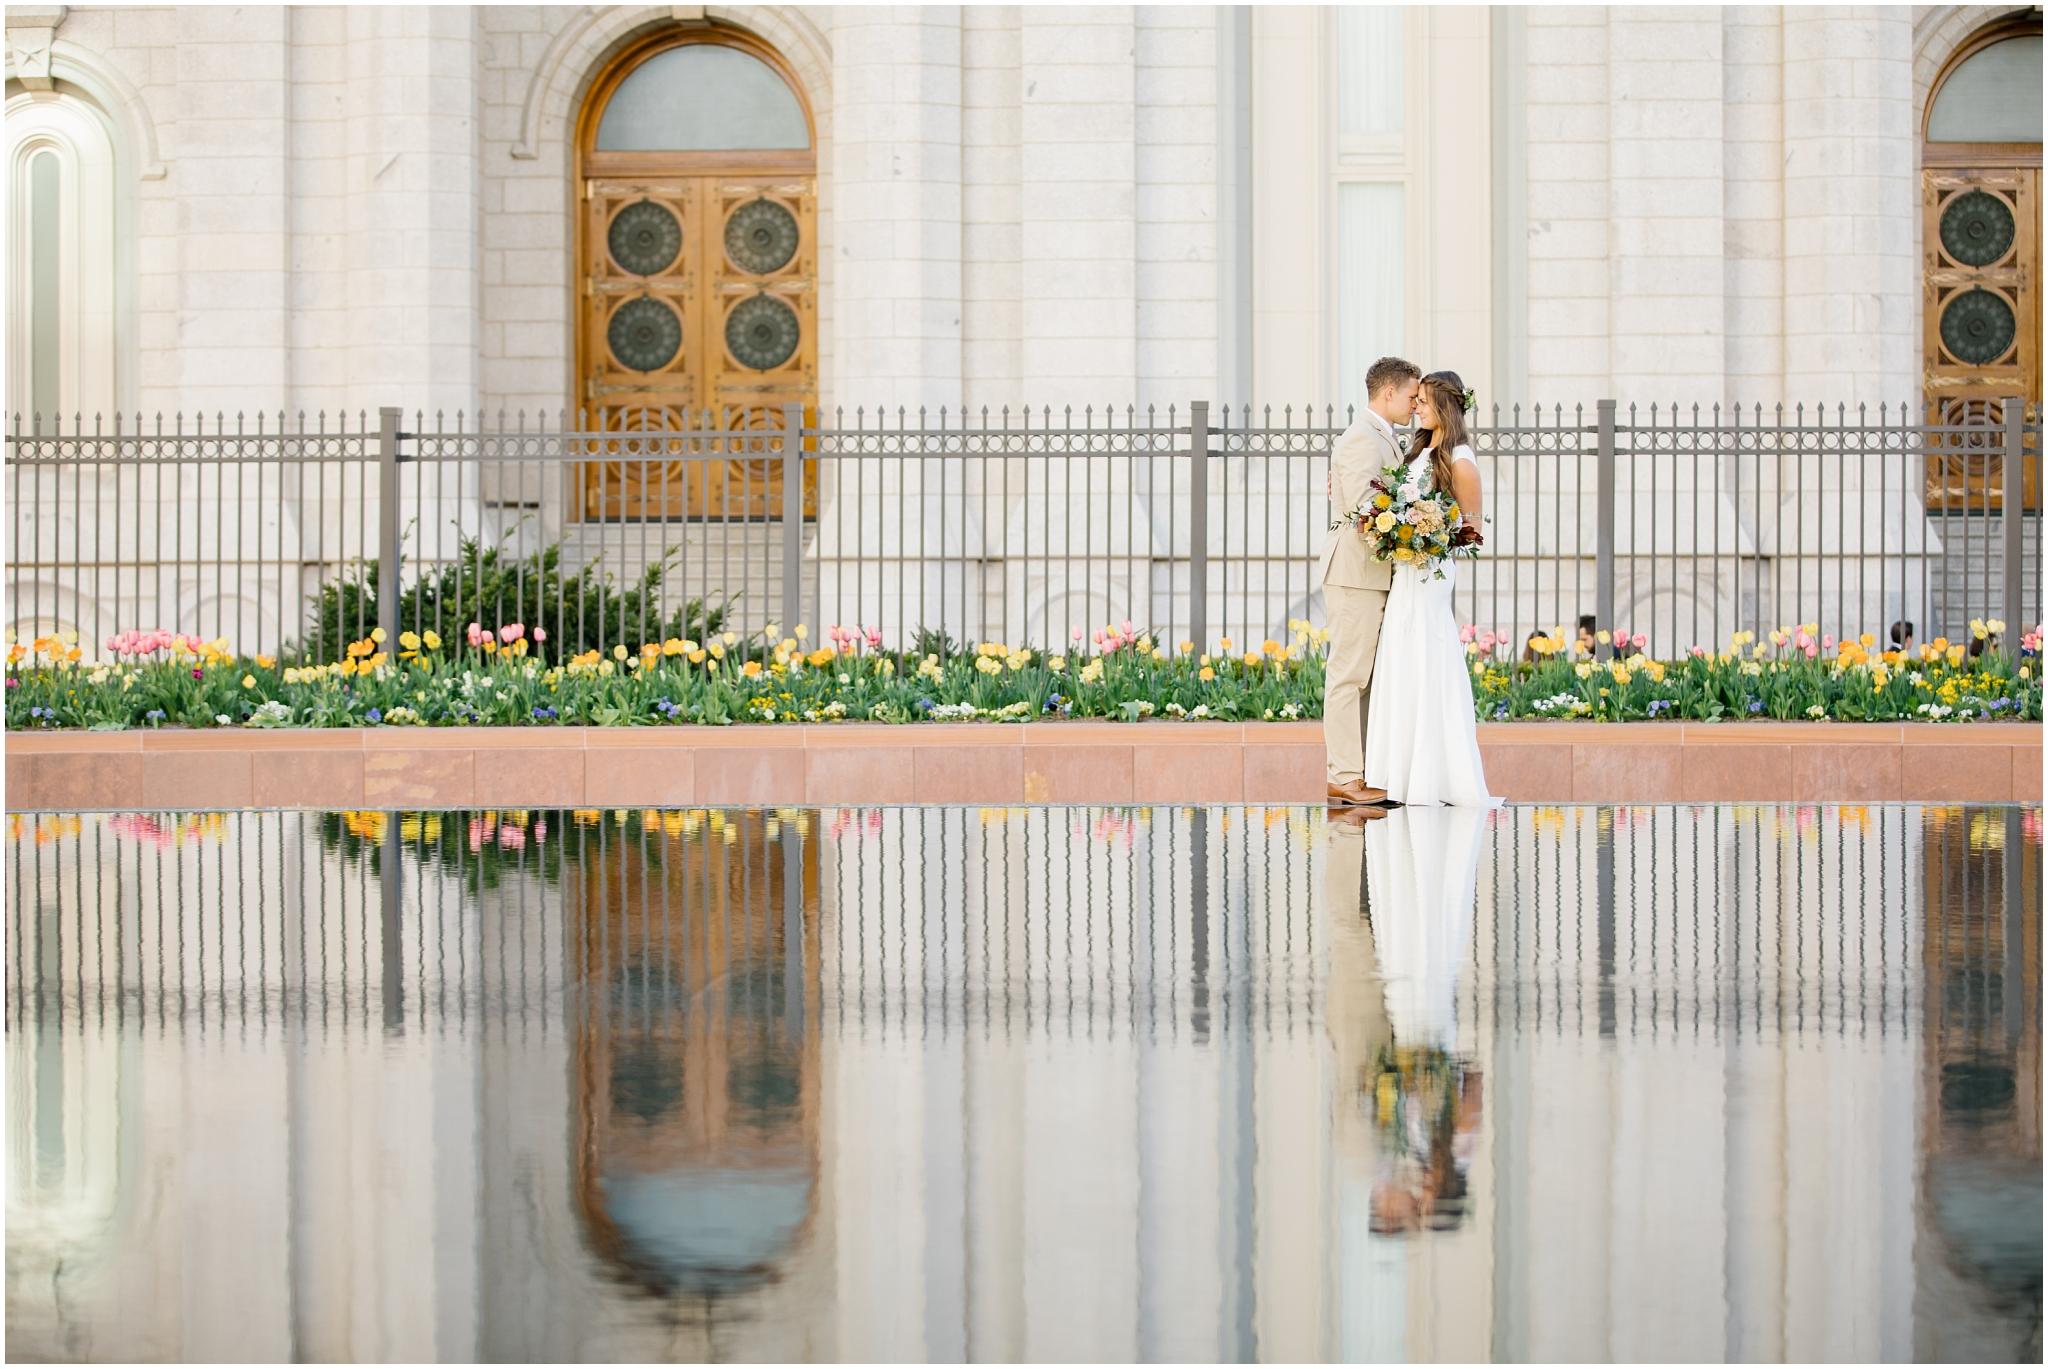 JC-Wedding-210_Lizzie-B-Imagery-Utah-Wedding-Photographer-Salt-Lake-City-Temple-Joseph-Smith-Memorial-Building-Reception.jpg